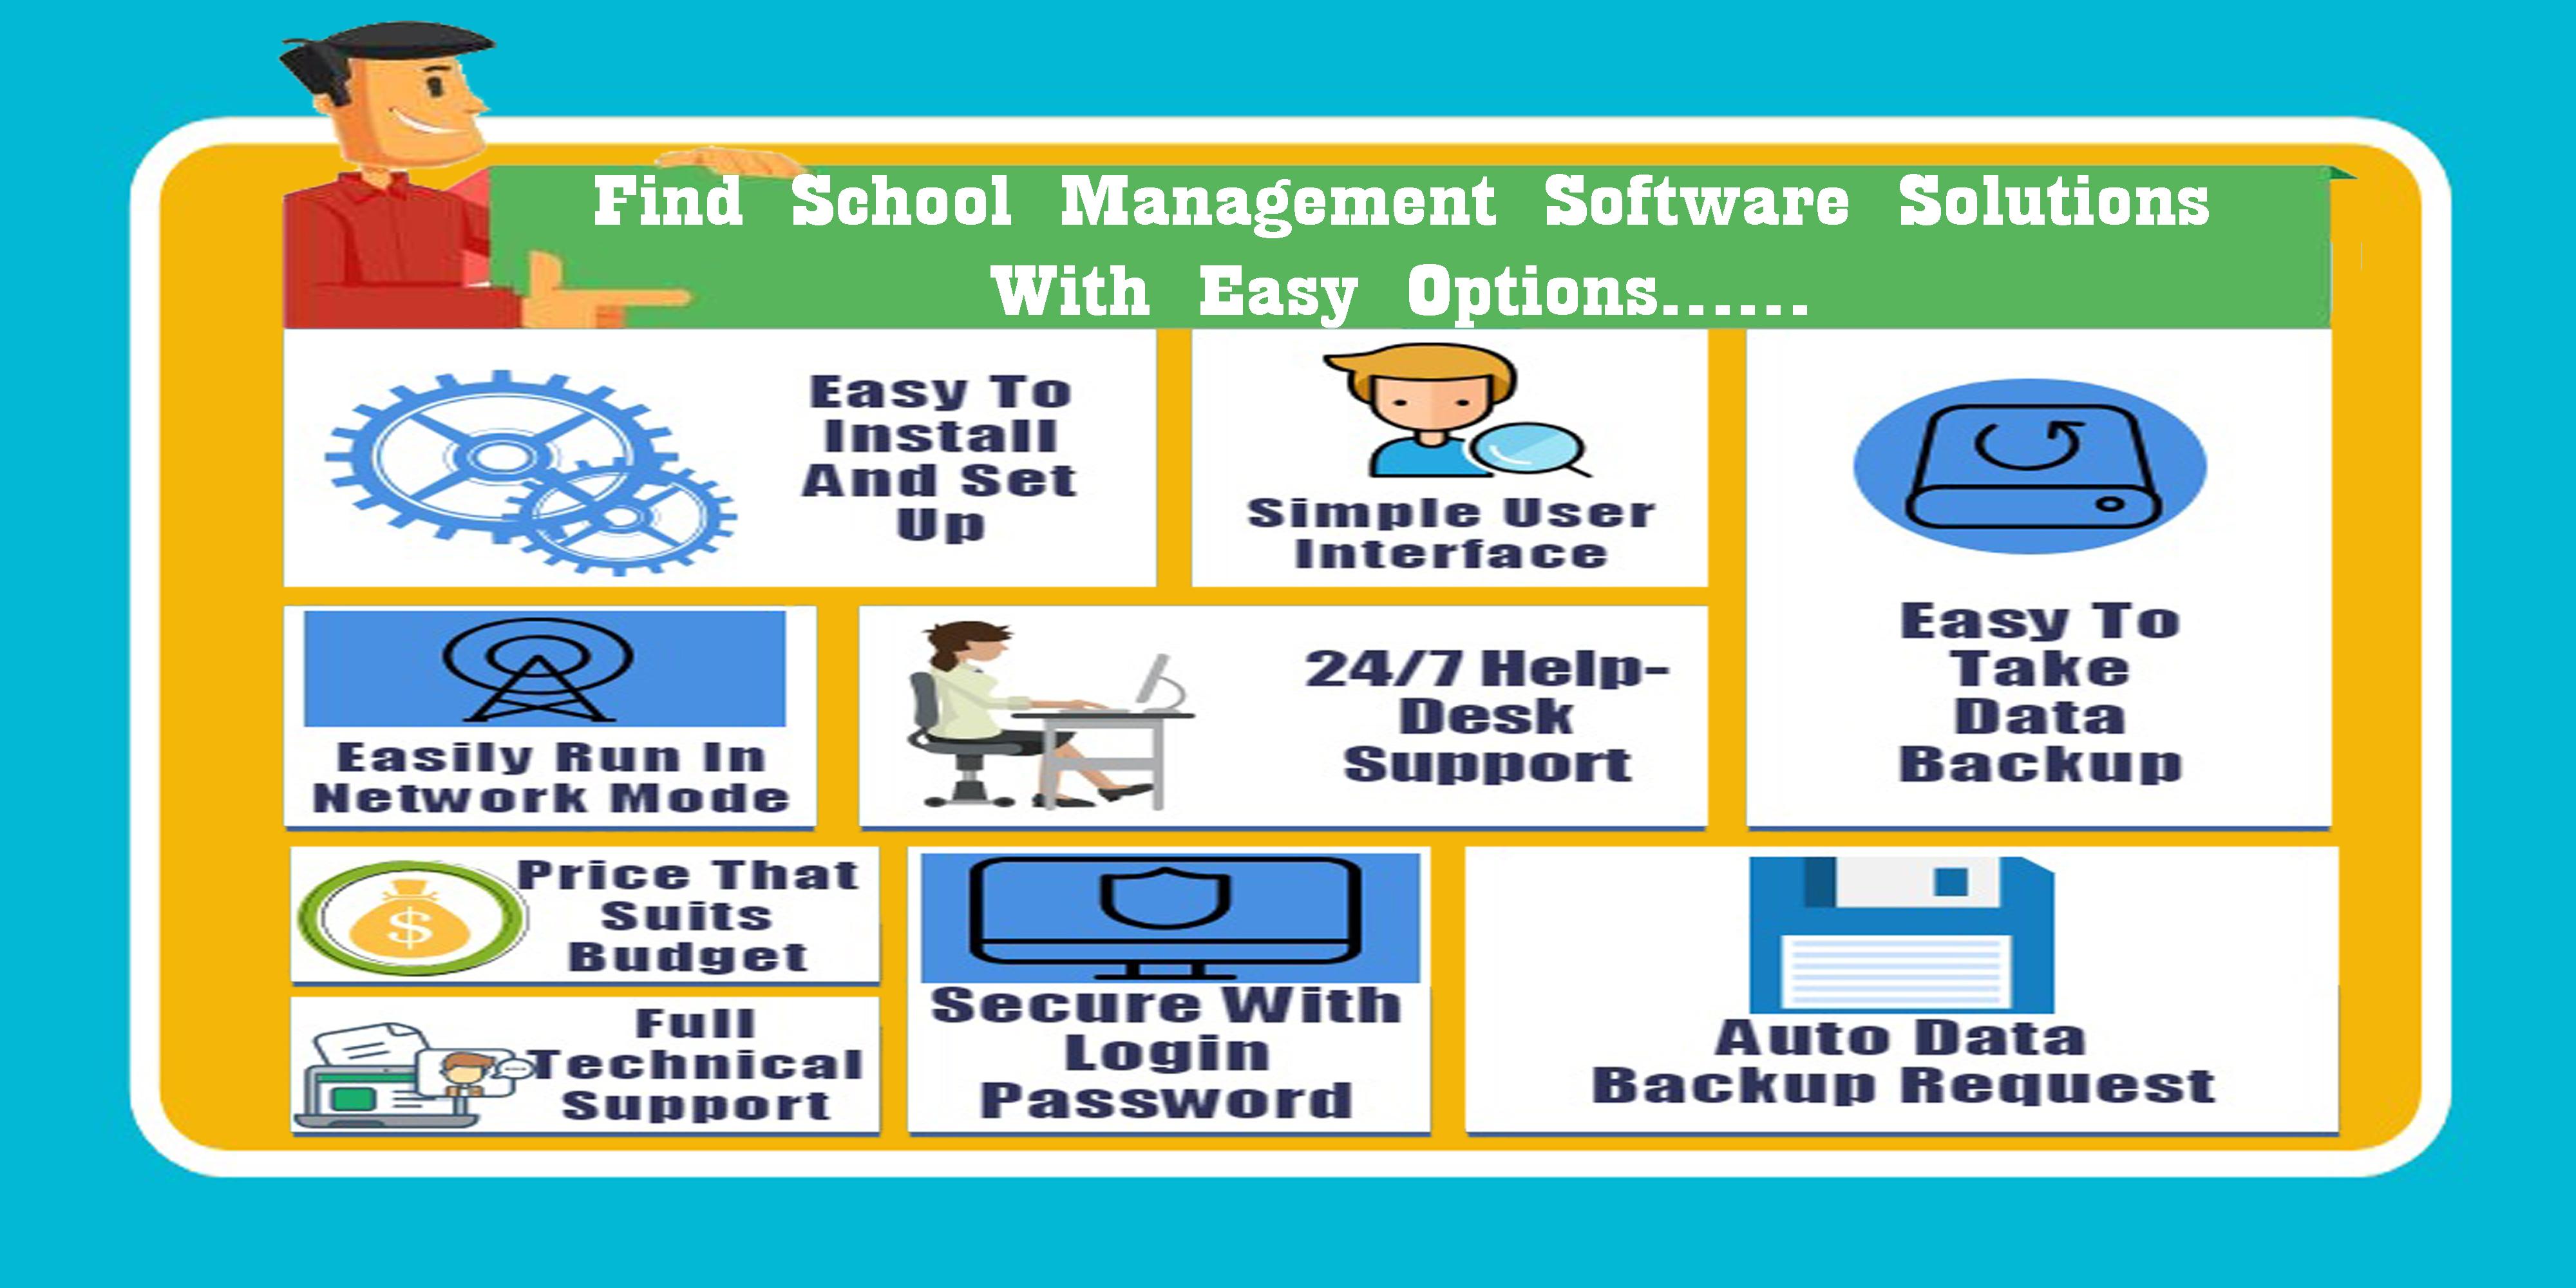 Find School Management Software Solutions